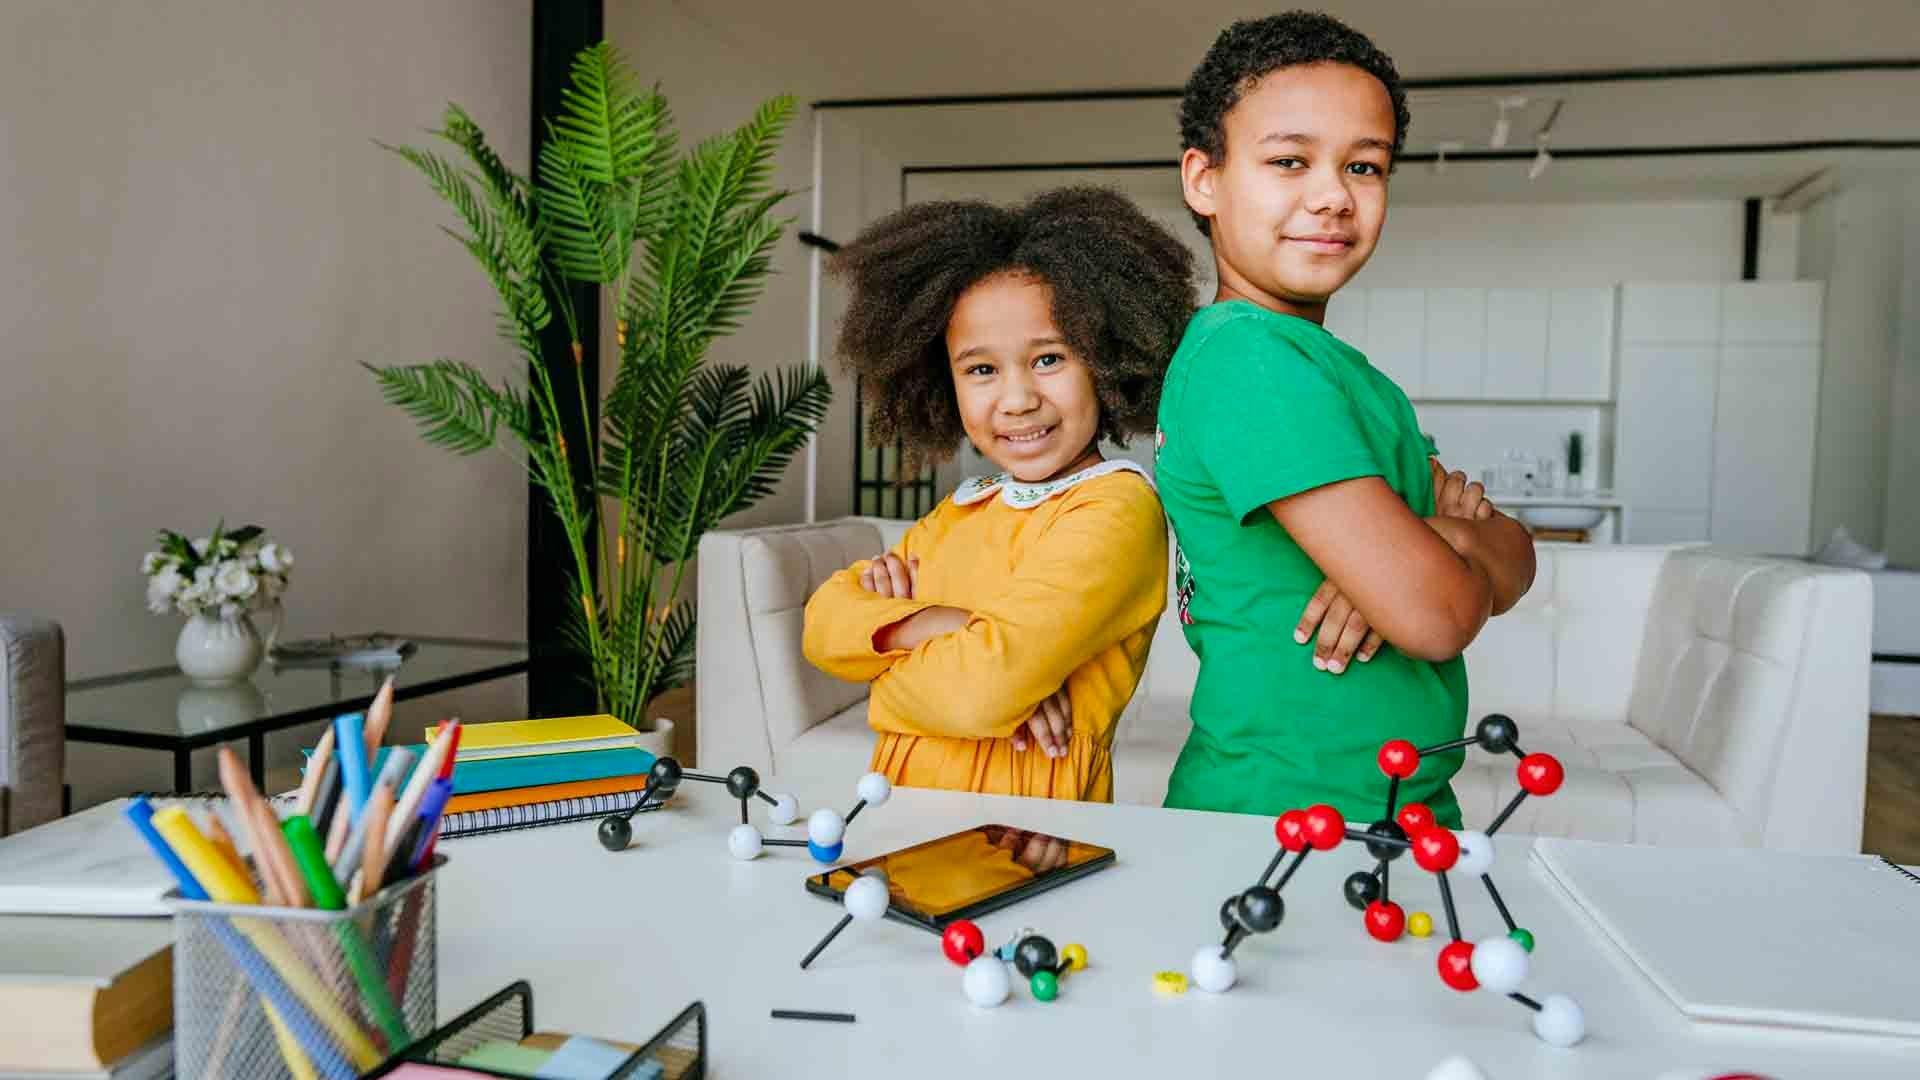 Eight Best Birthday Gift for Kids Ideas